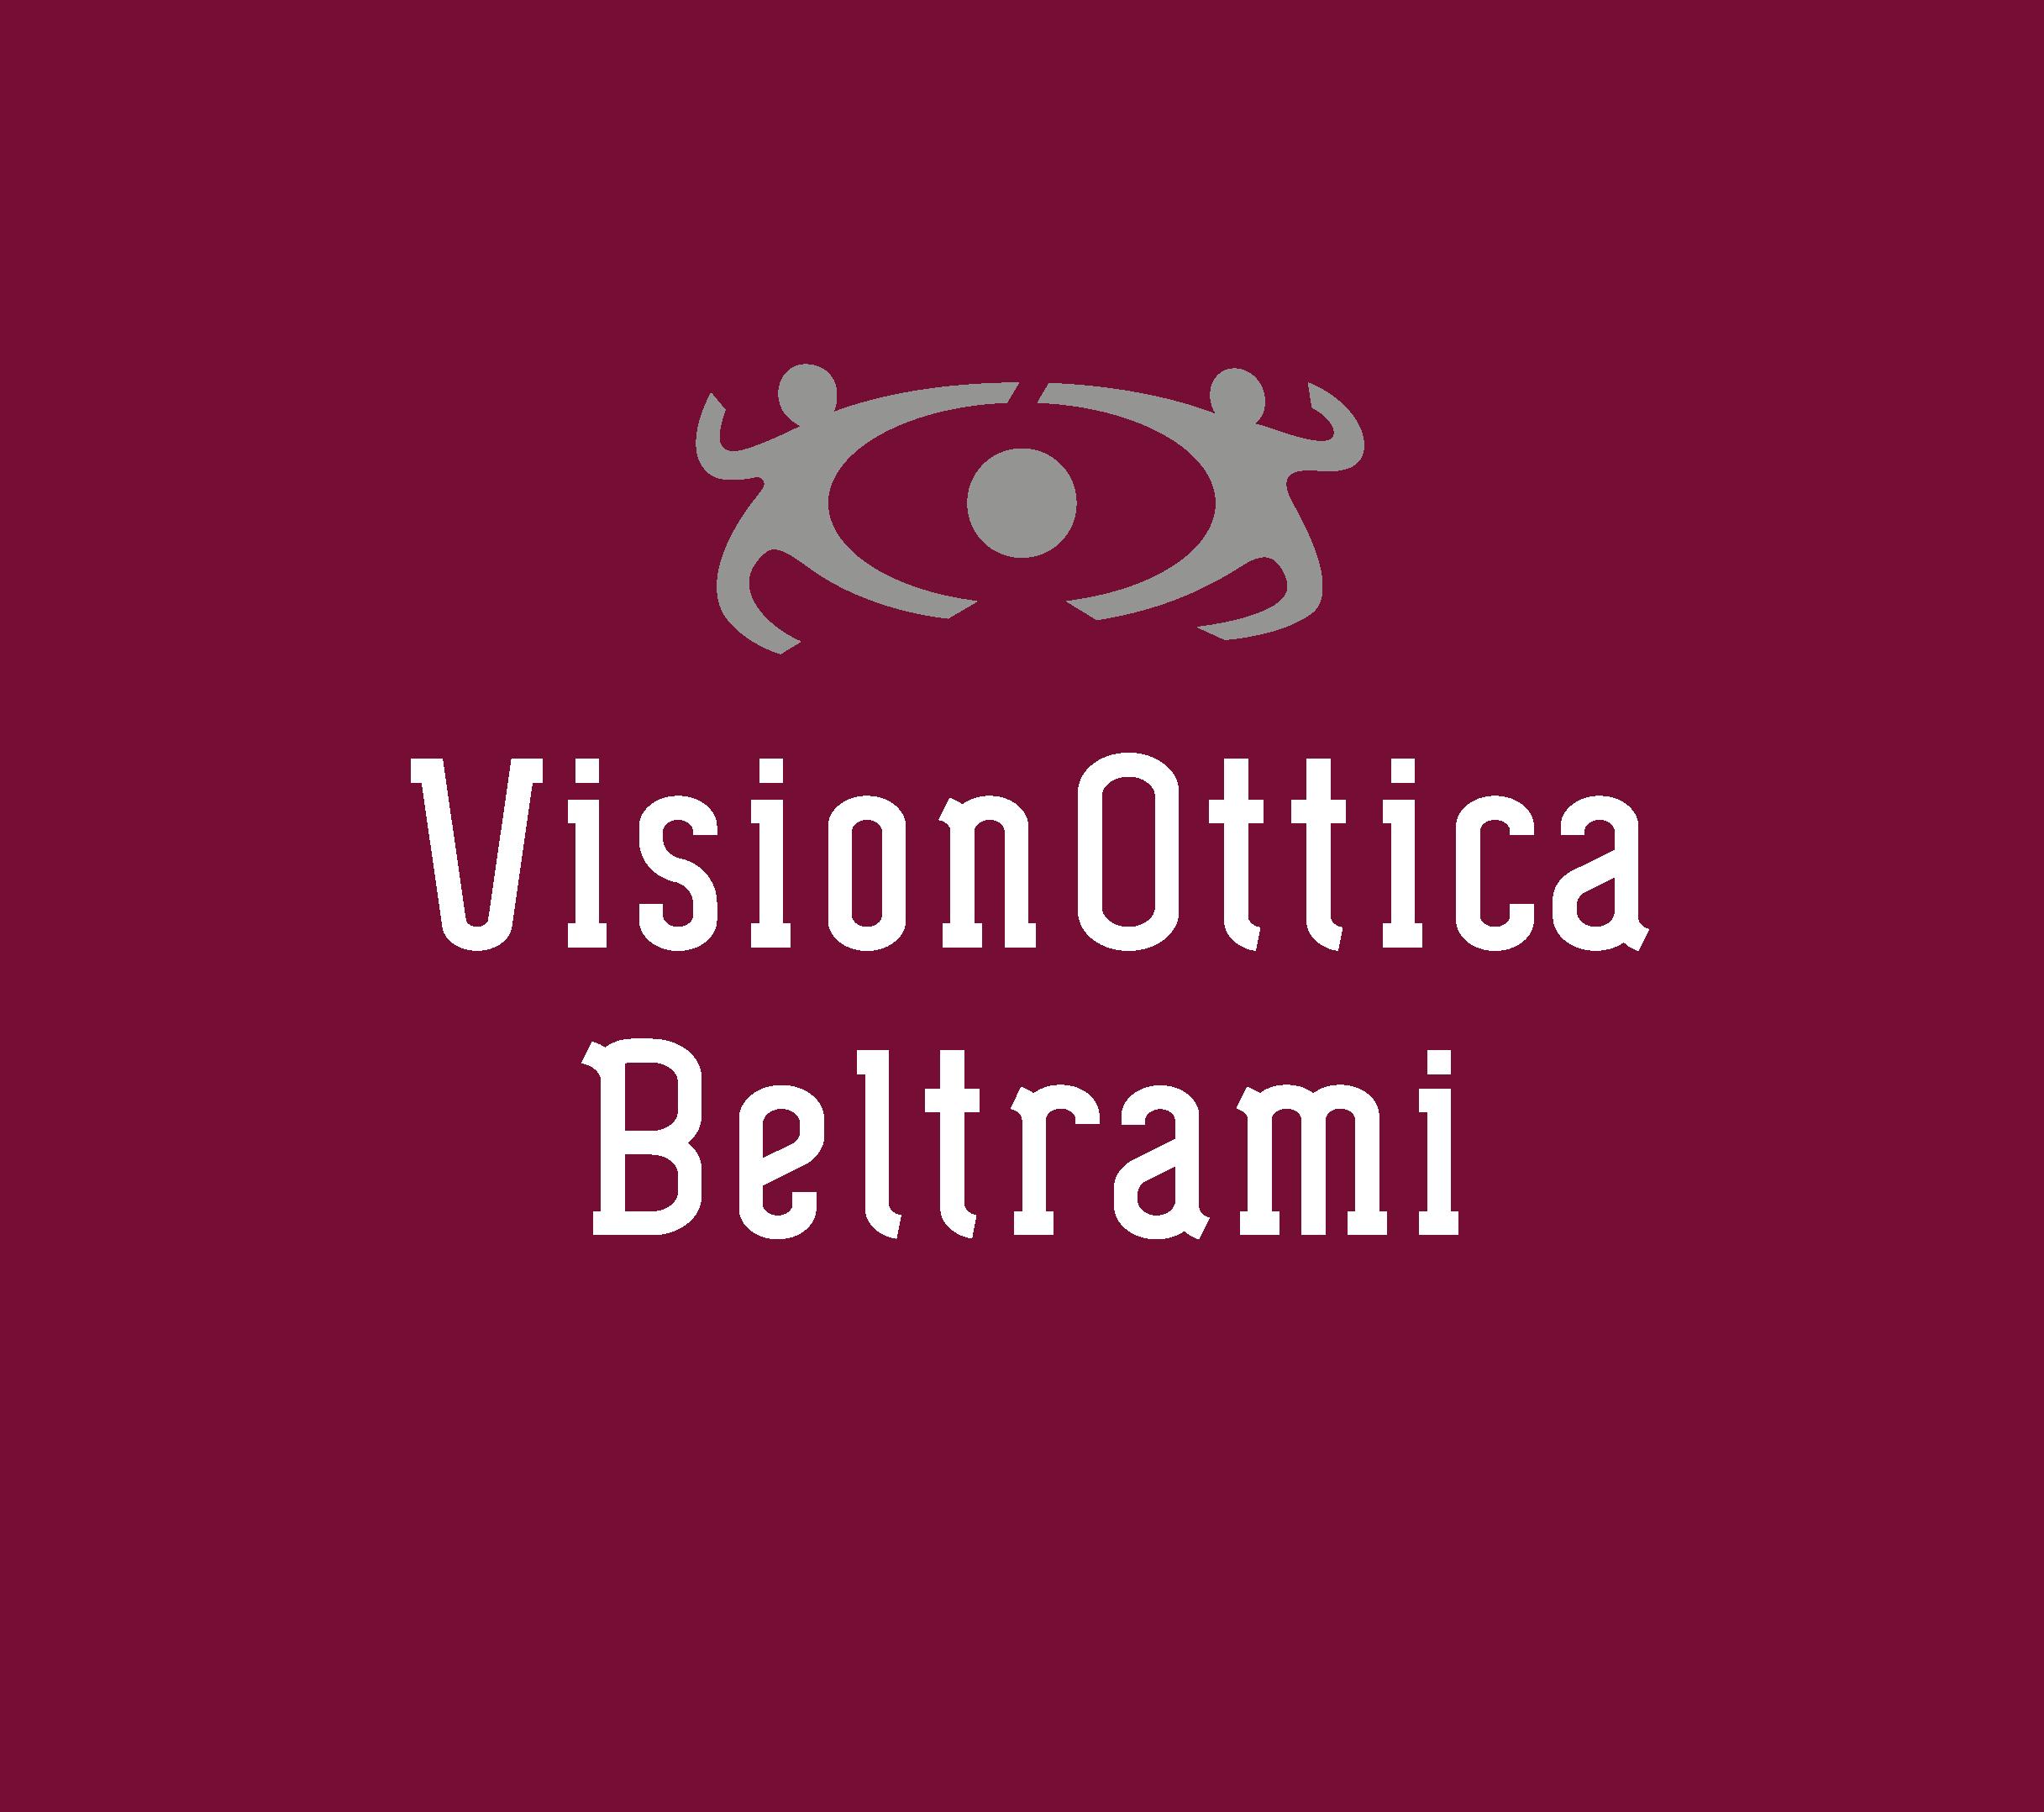 Vision Ottica Beltrami